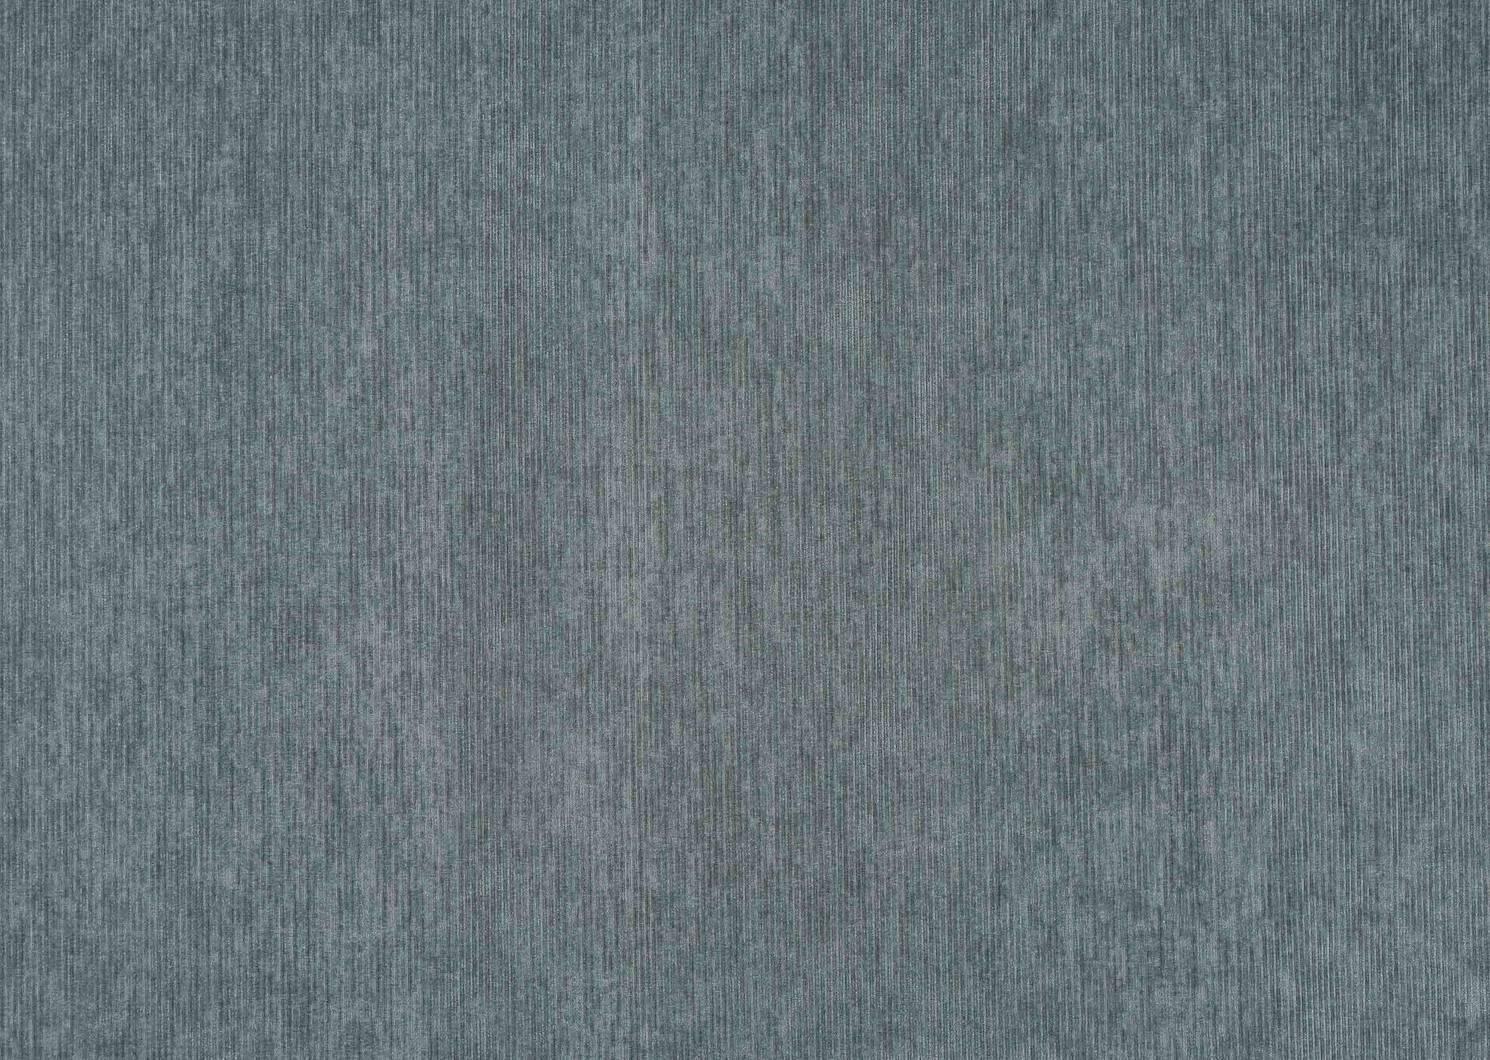 Marceline Panel 96 Silver Pine